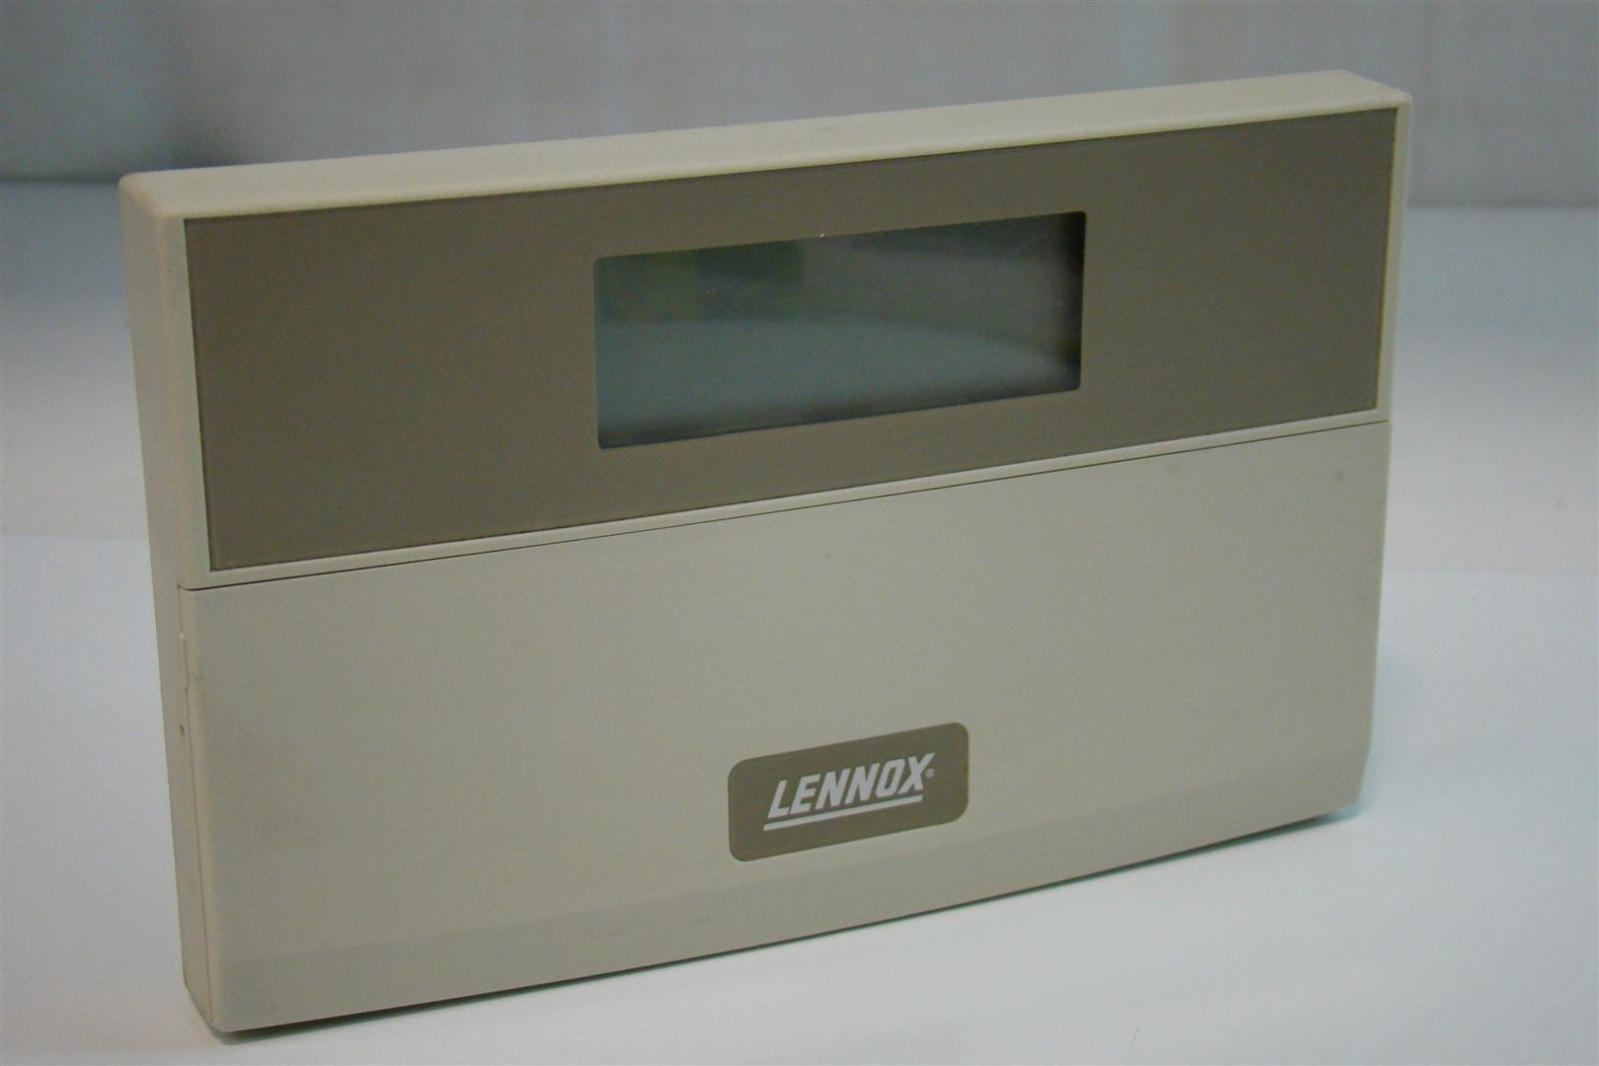 electric furnace lennox chevy delco radio wiring diagram honeywell t7300d2072 9940 37l5401 ebay